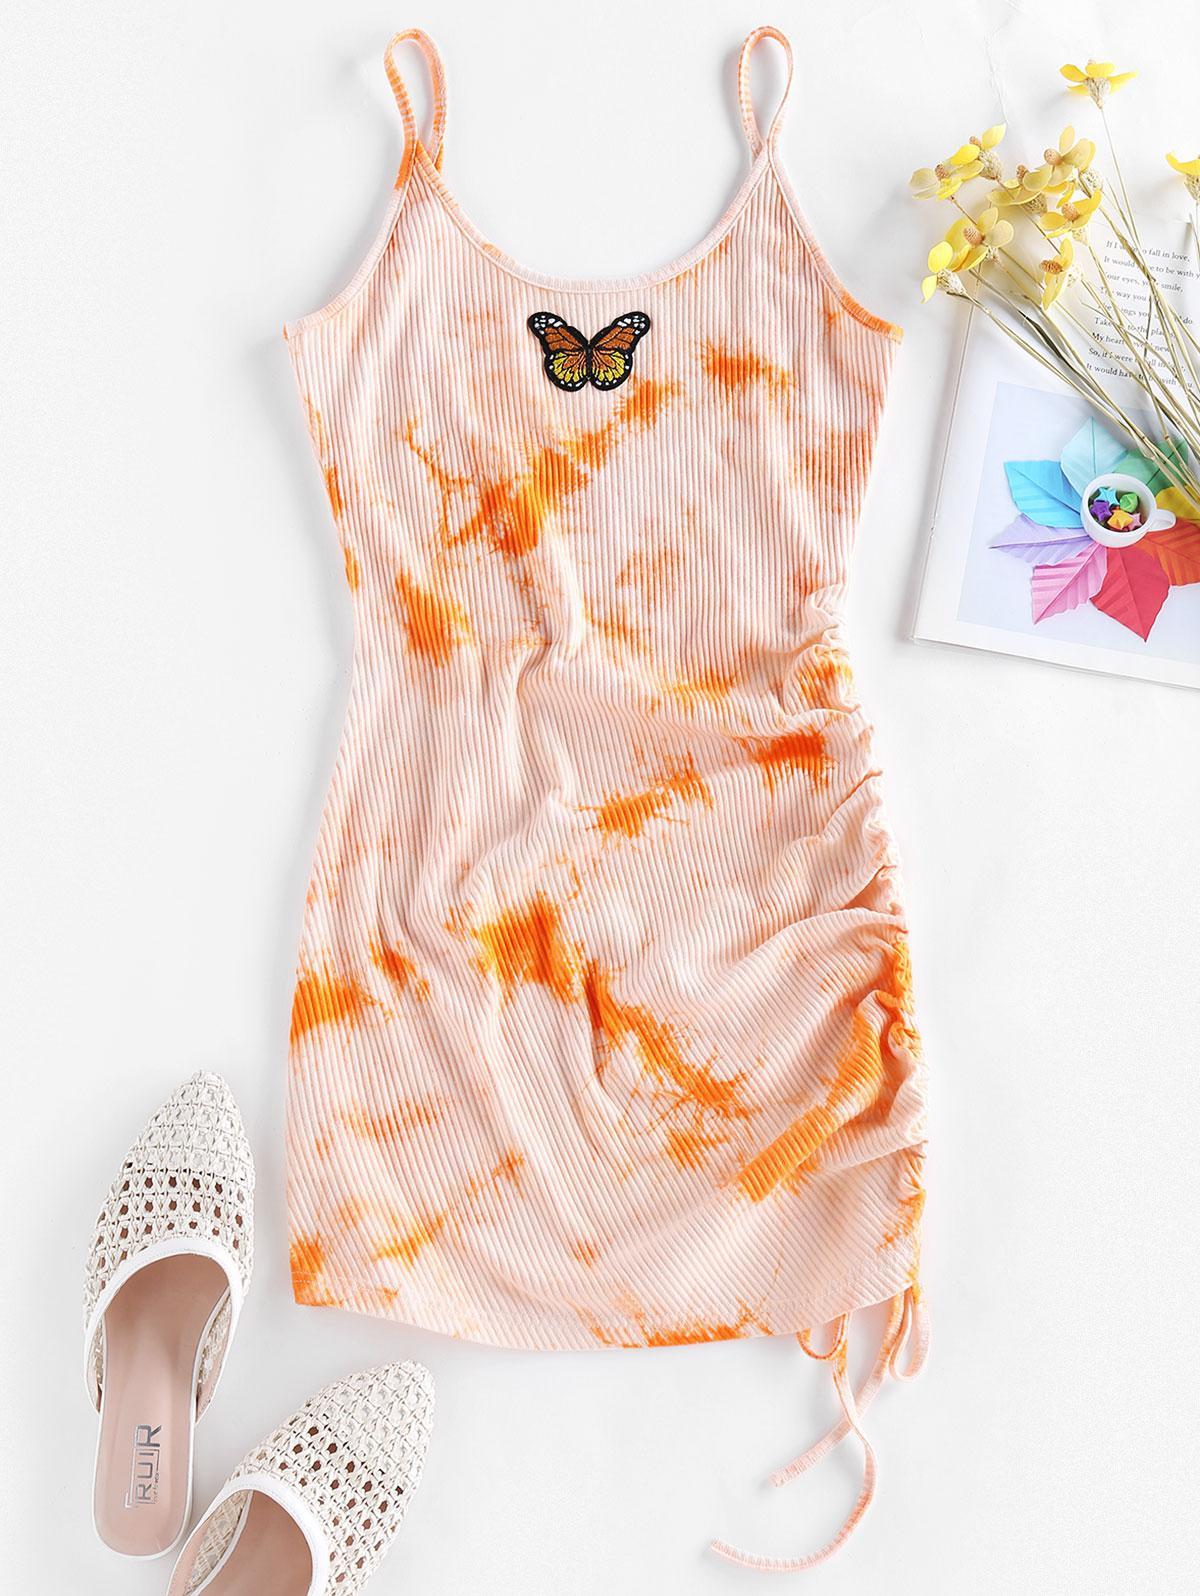 ZAFUL Butterfly Embroidery Tie Dye Cinched Dress